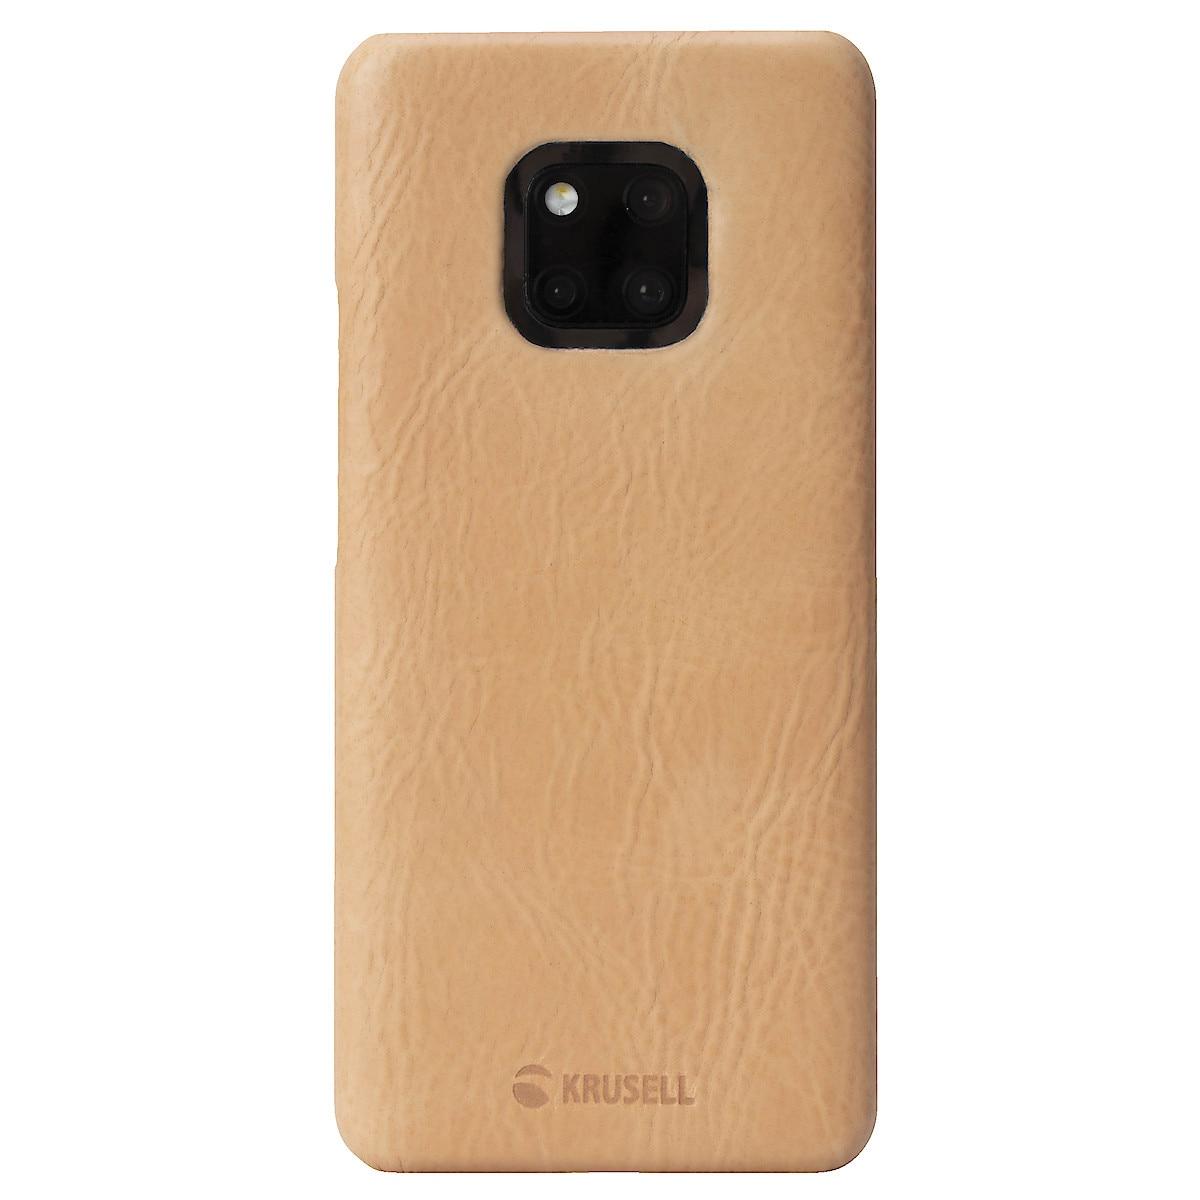 Mobilskal för Huawei Mate 20 Pro Krusell